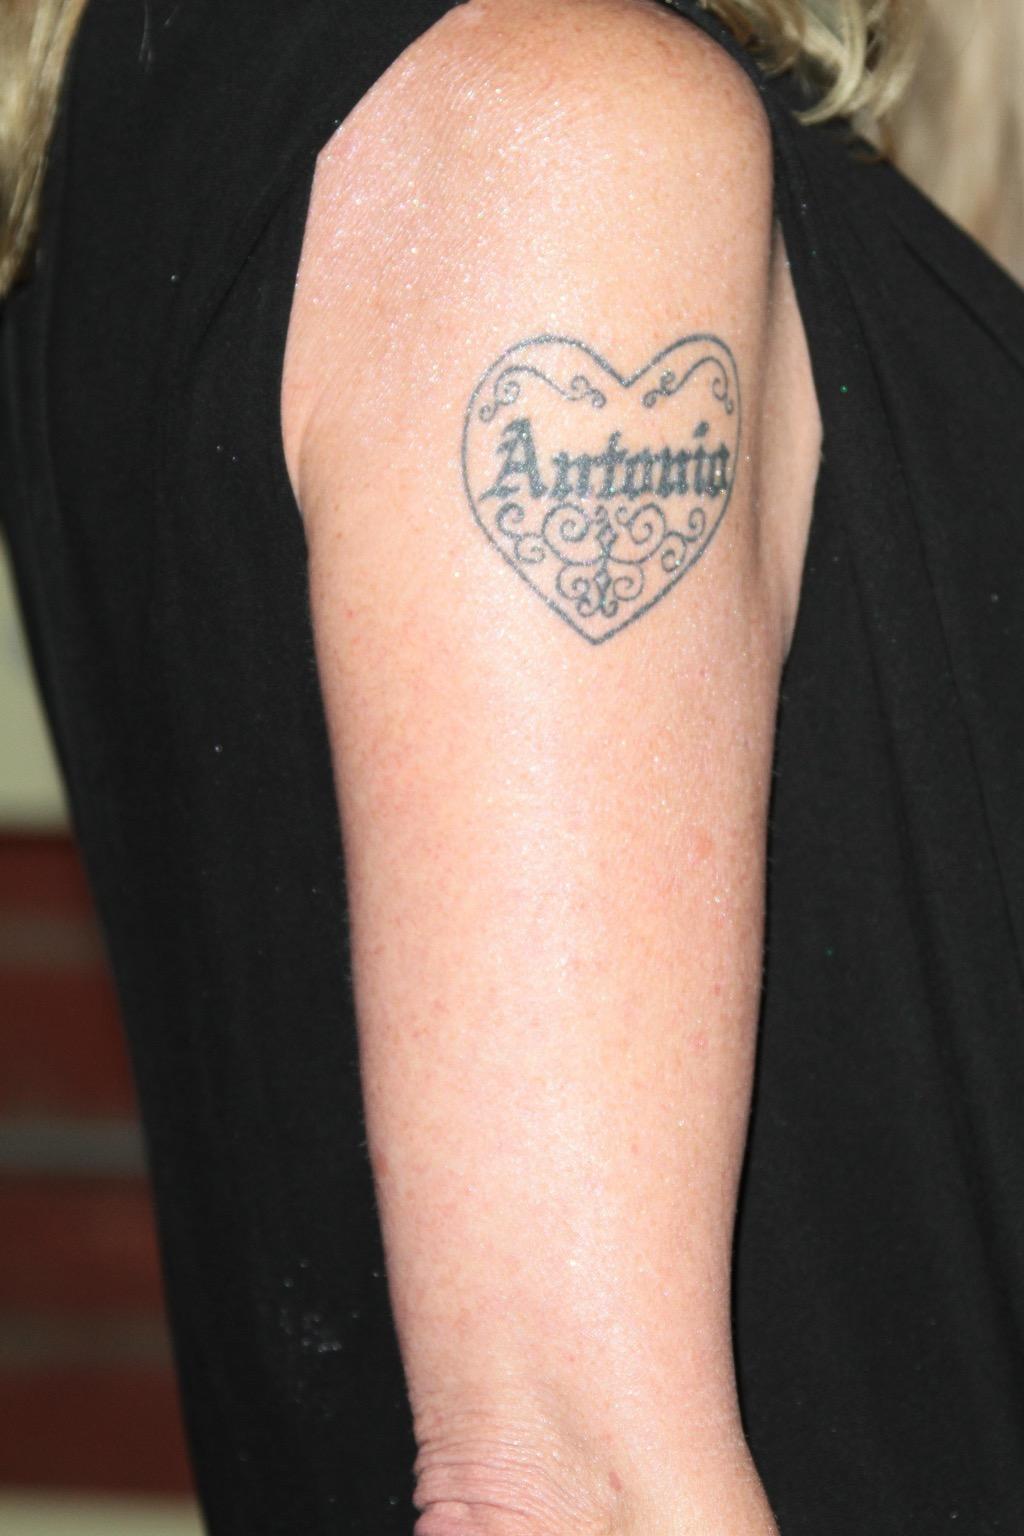 Melanie Griffith Antonio tattoo